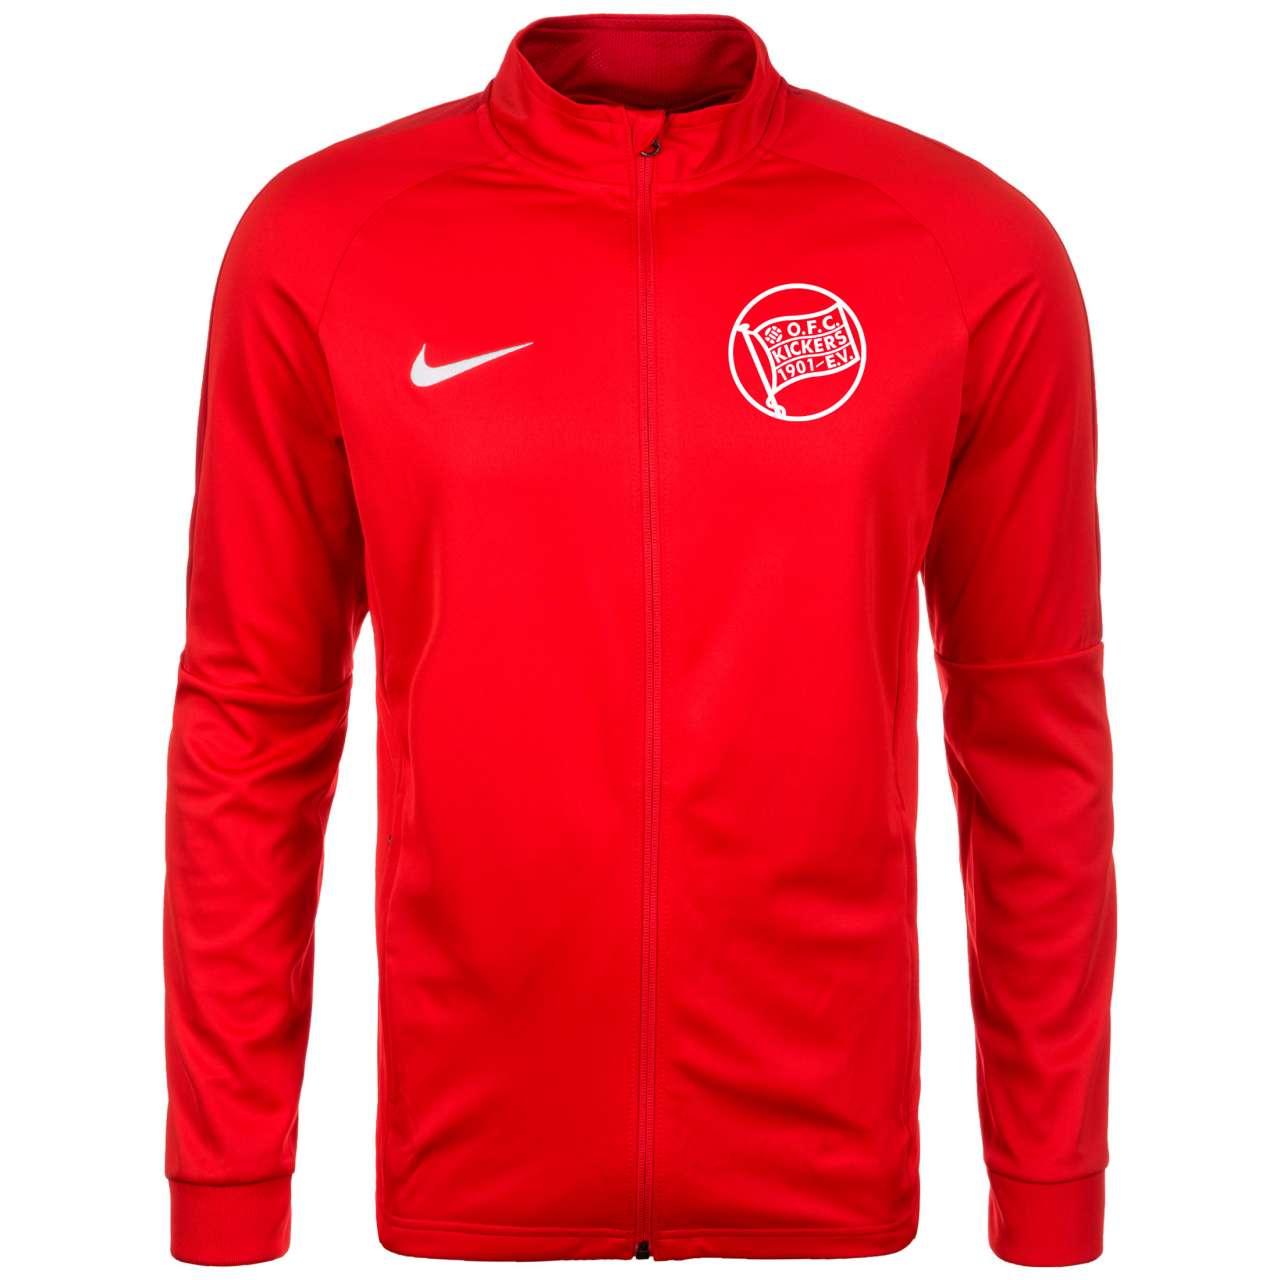 Nike Trainingsjacke 18/19